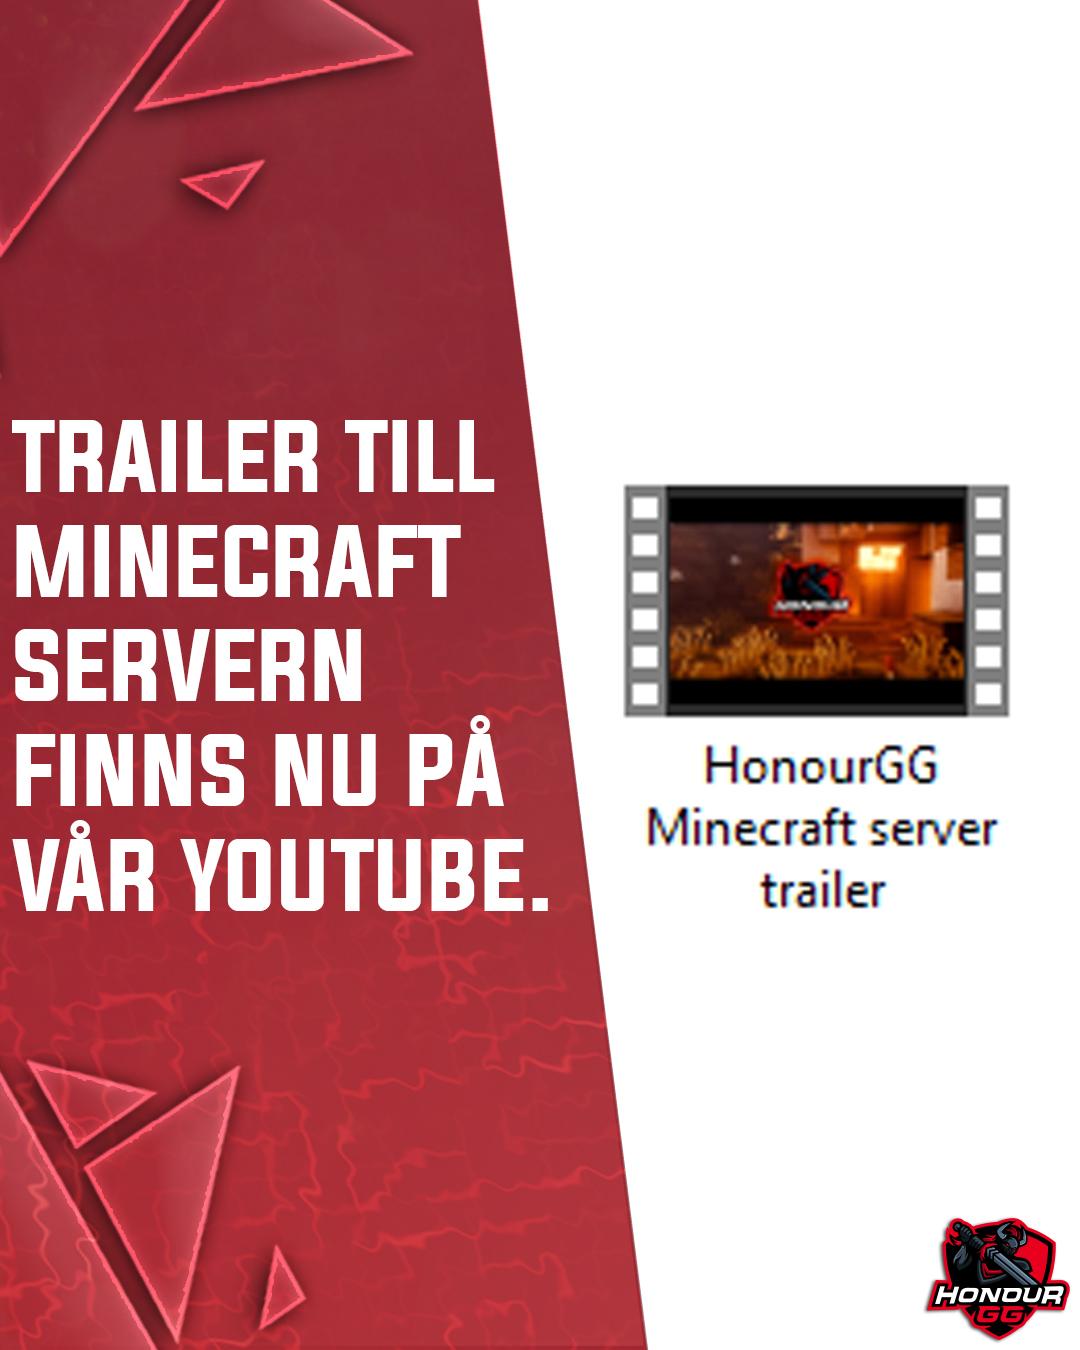 HonourGG trailer